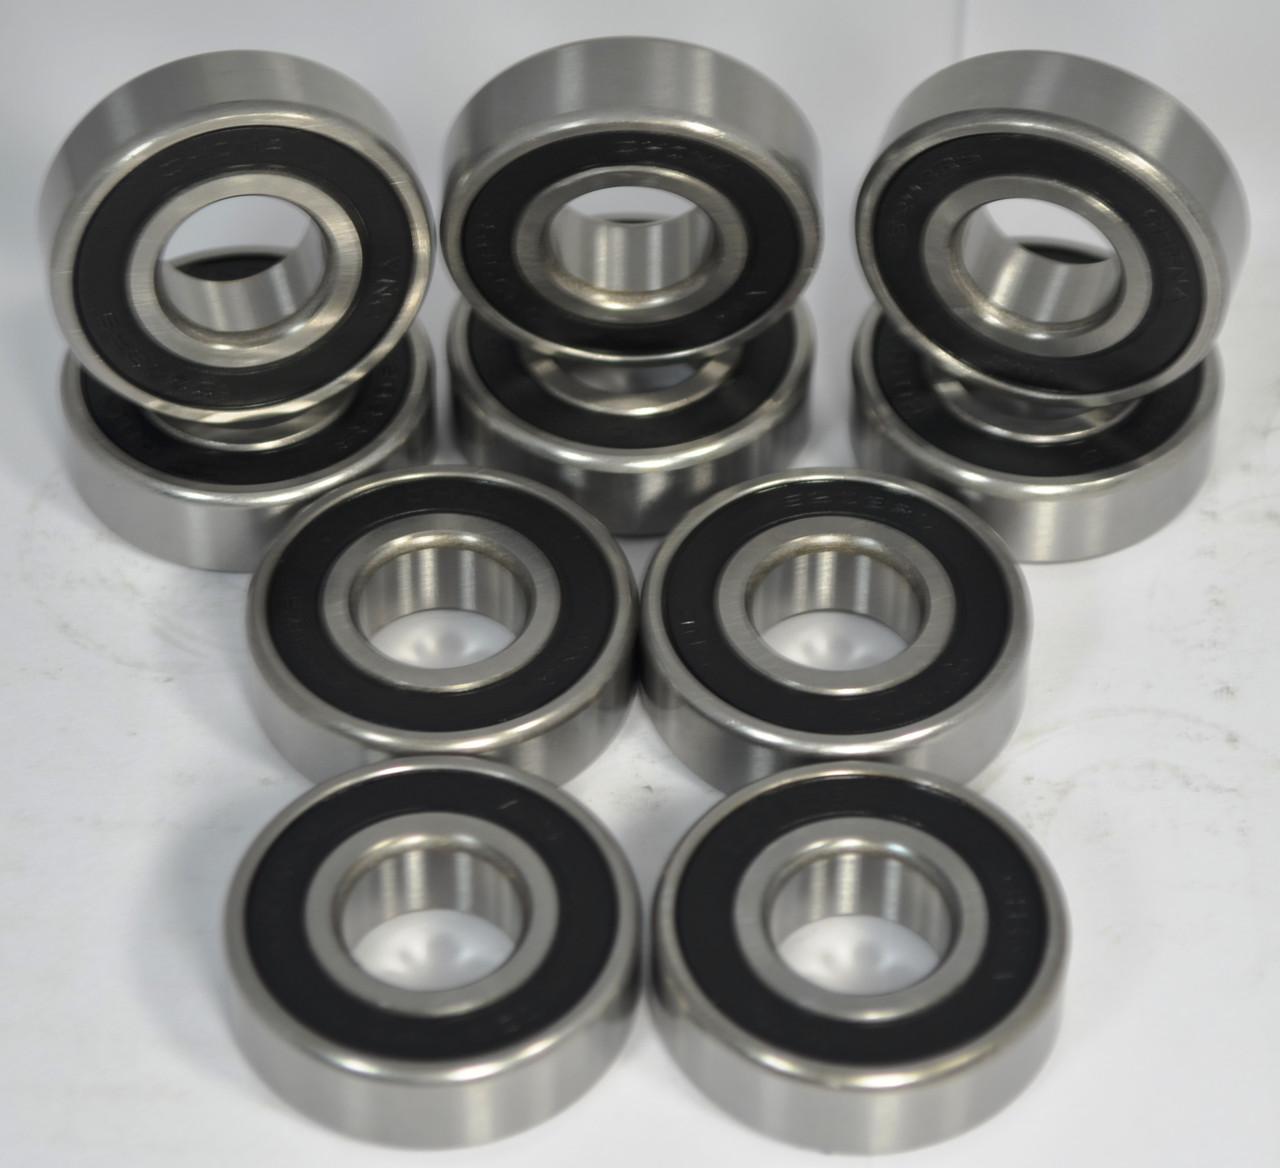 (Qty 10) 1621-2RS - Rubber Seals